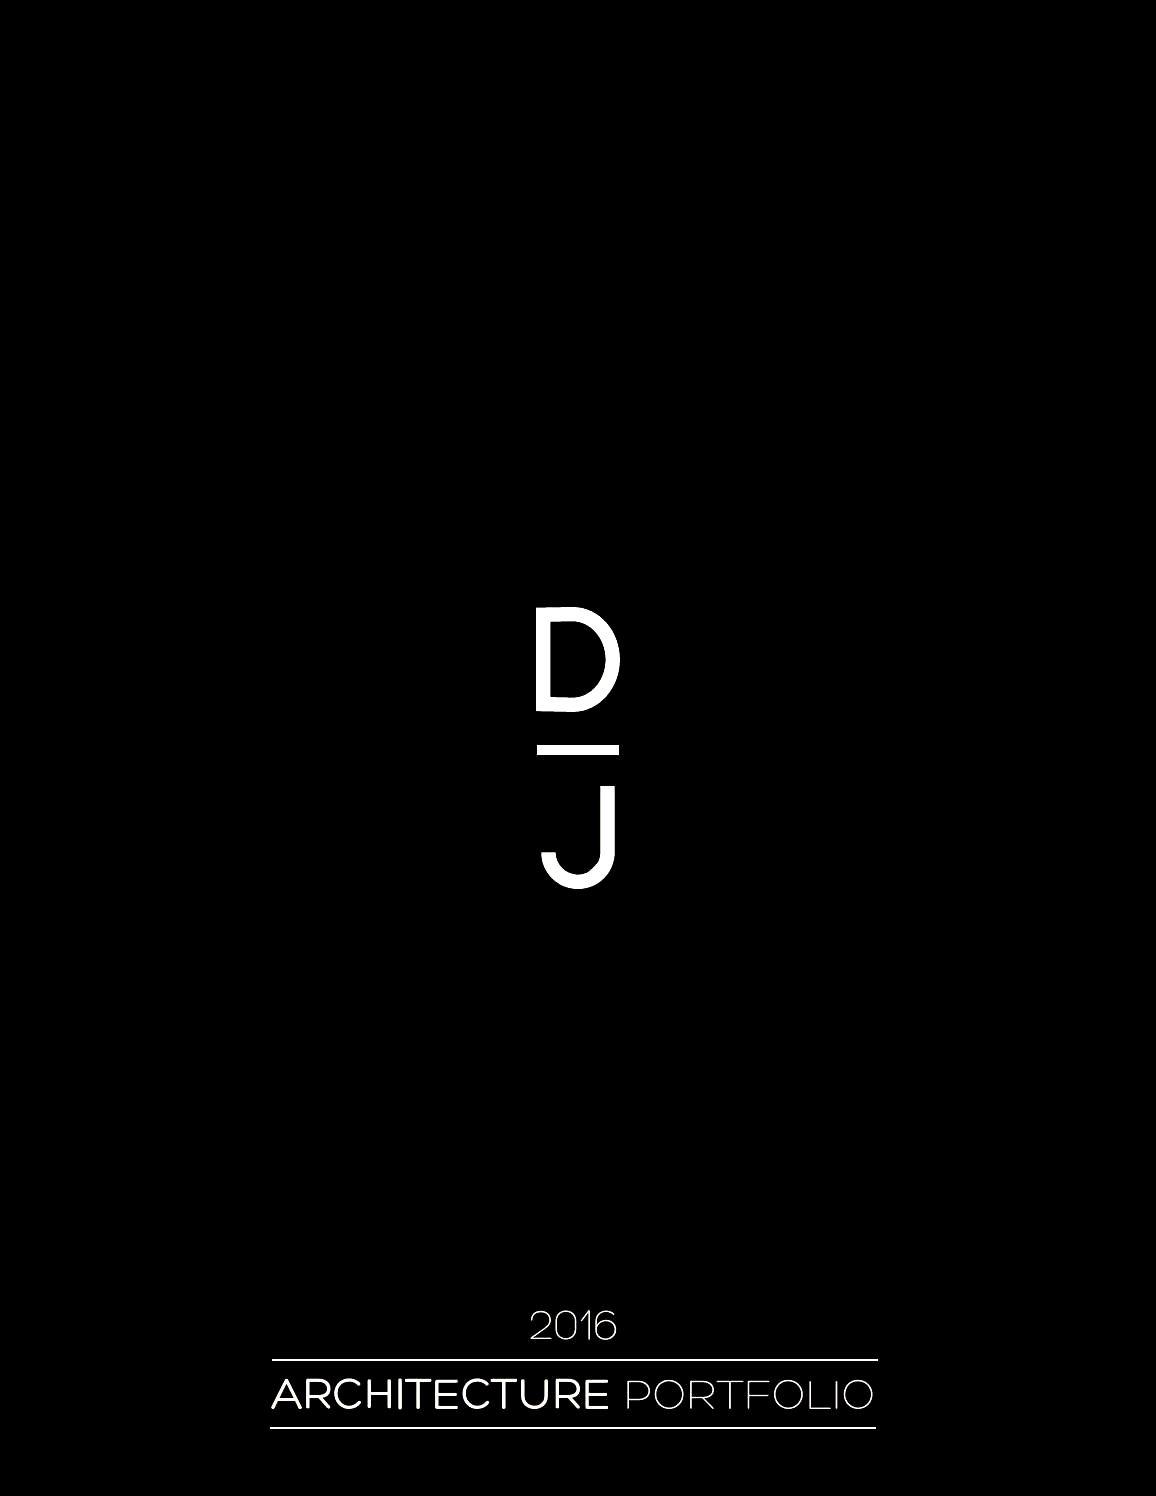 2016 Architecture Portfolio Dorian Janowicz